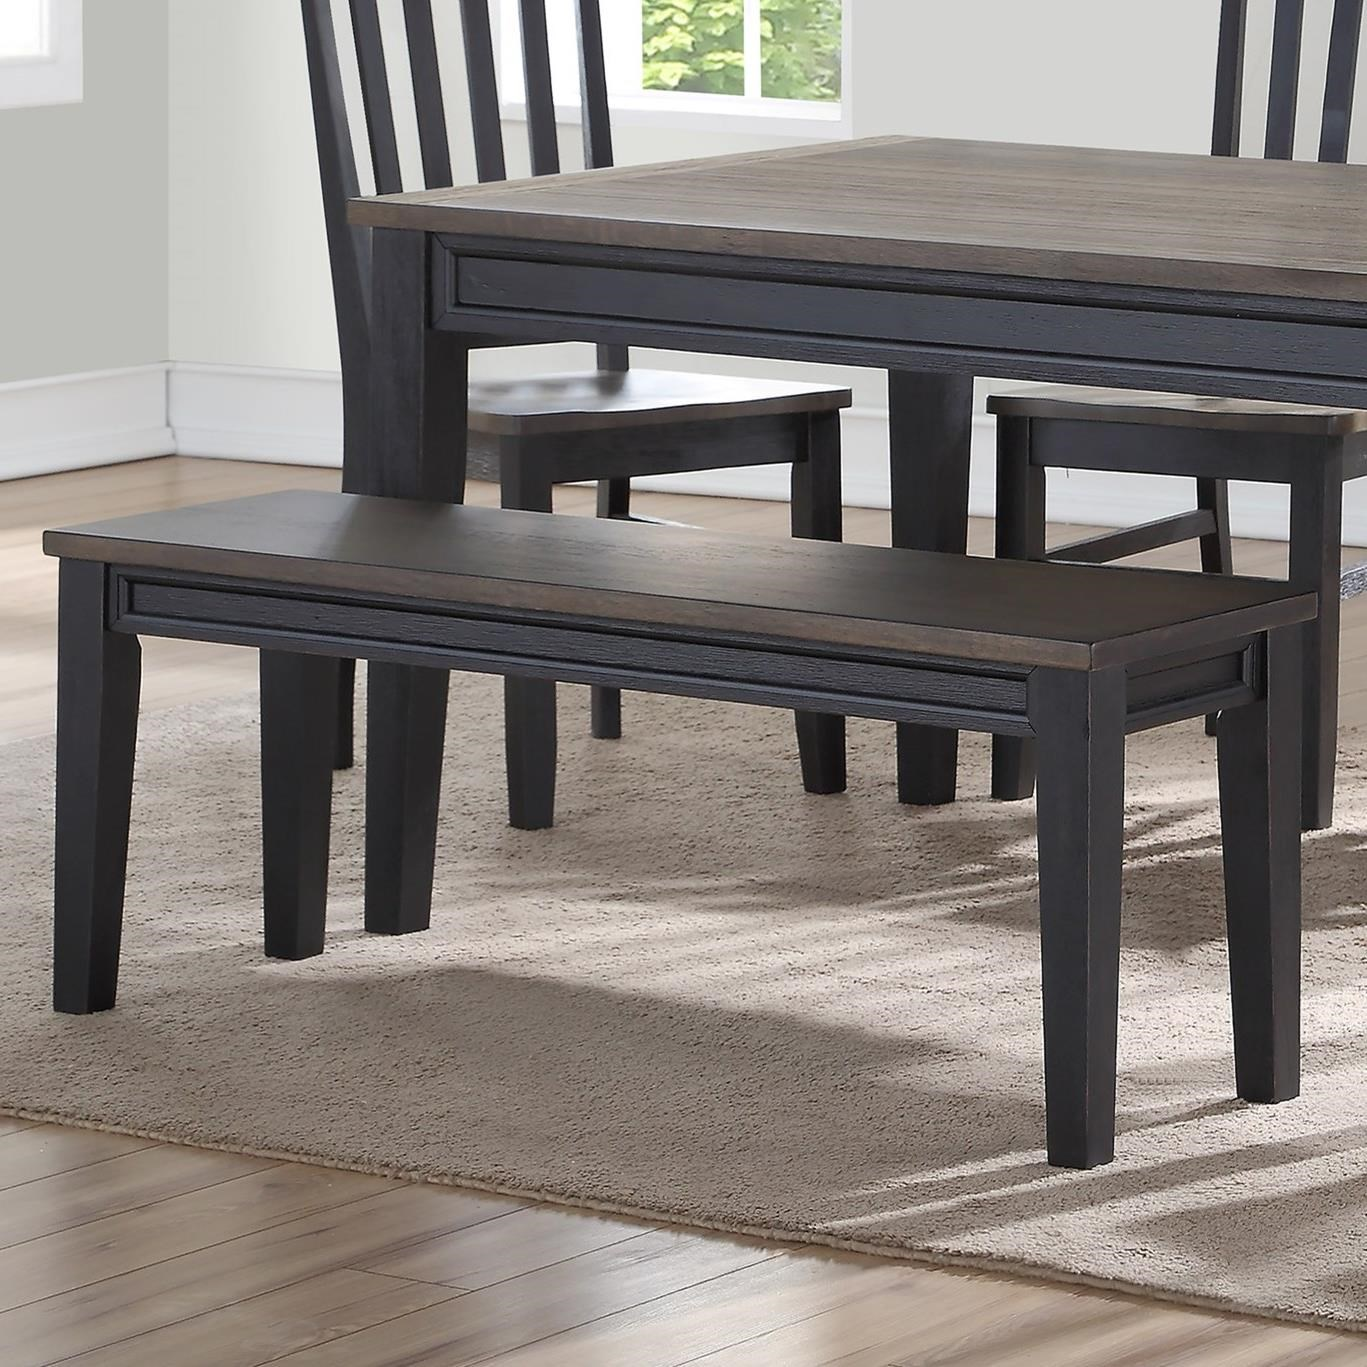 Raven Bench by Steve Silver at Walker's Furniture